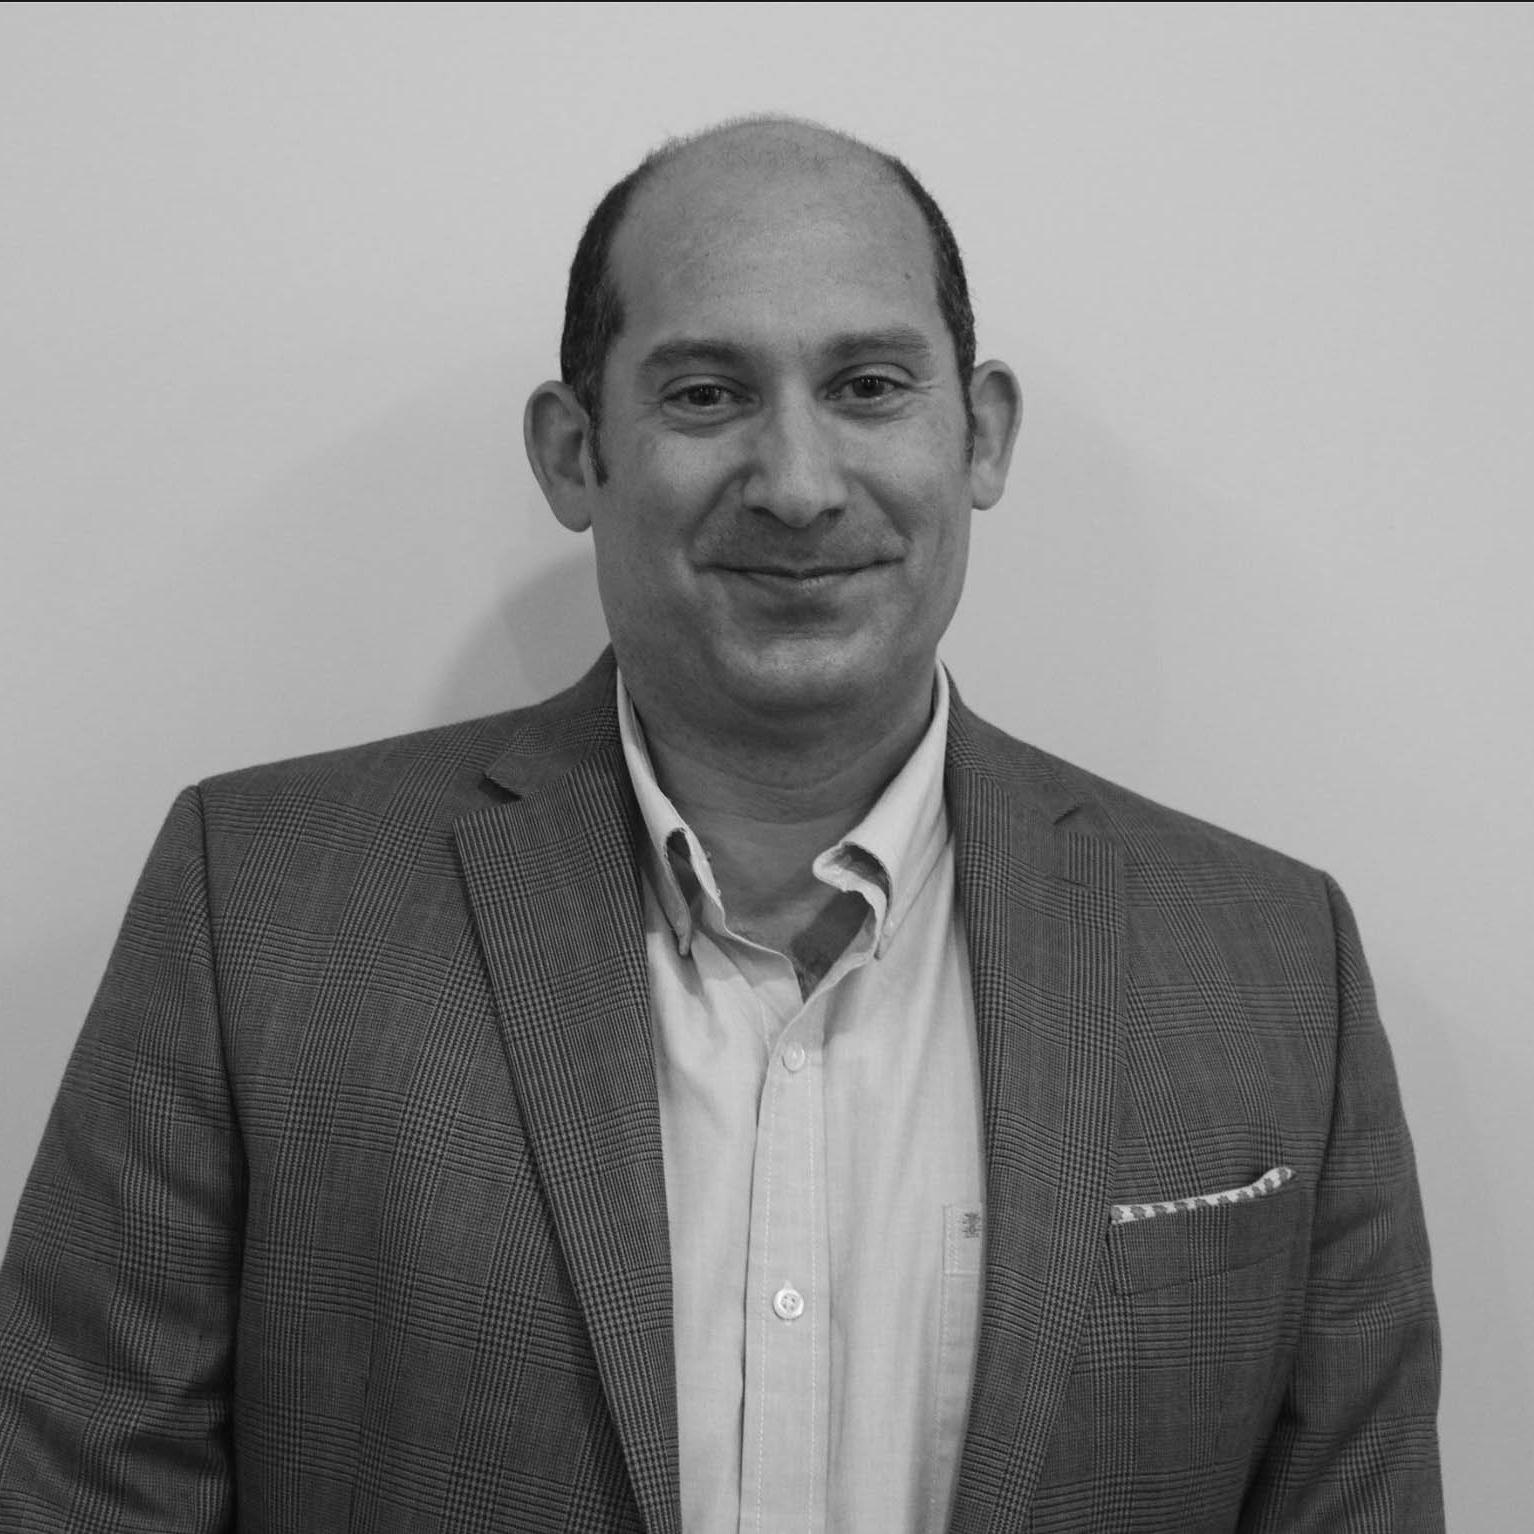 Josh Chalmers - CEO of Earth2